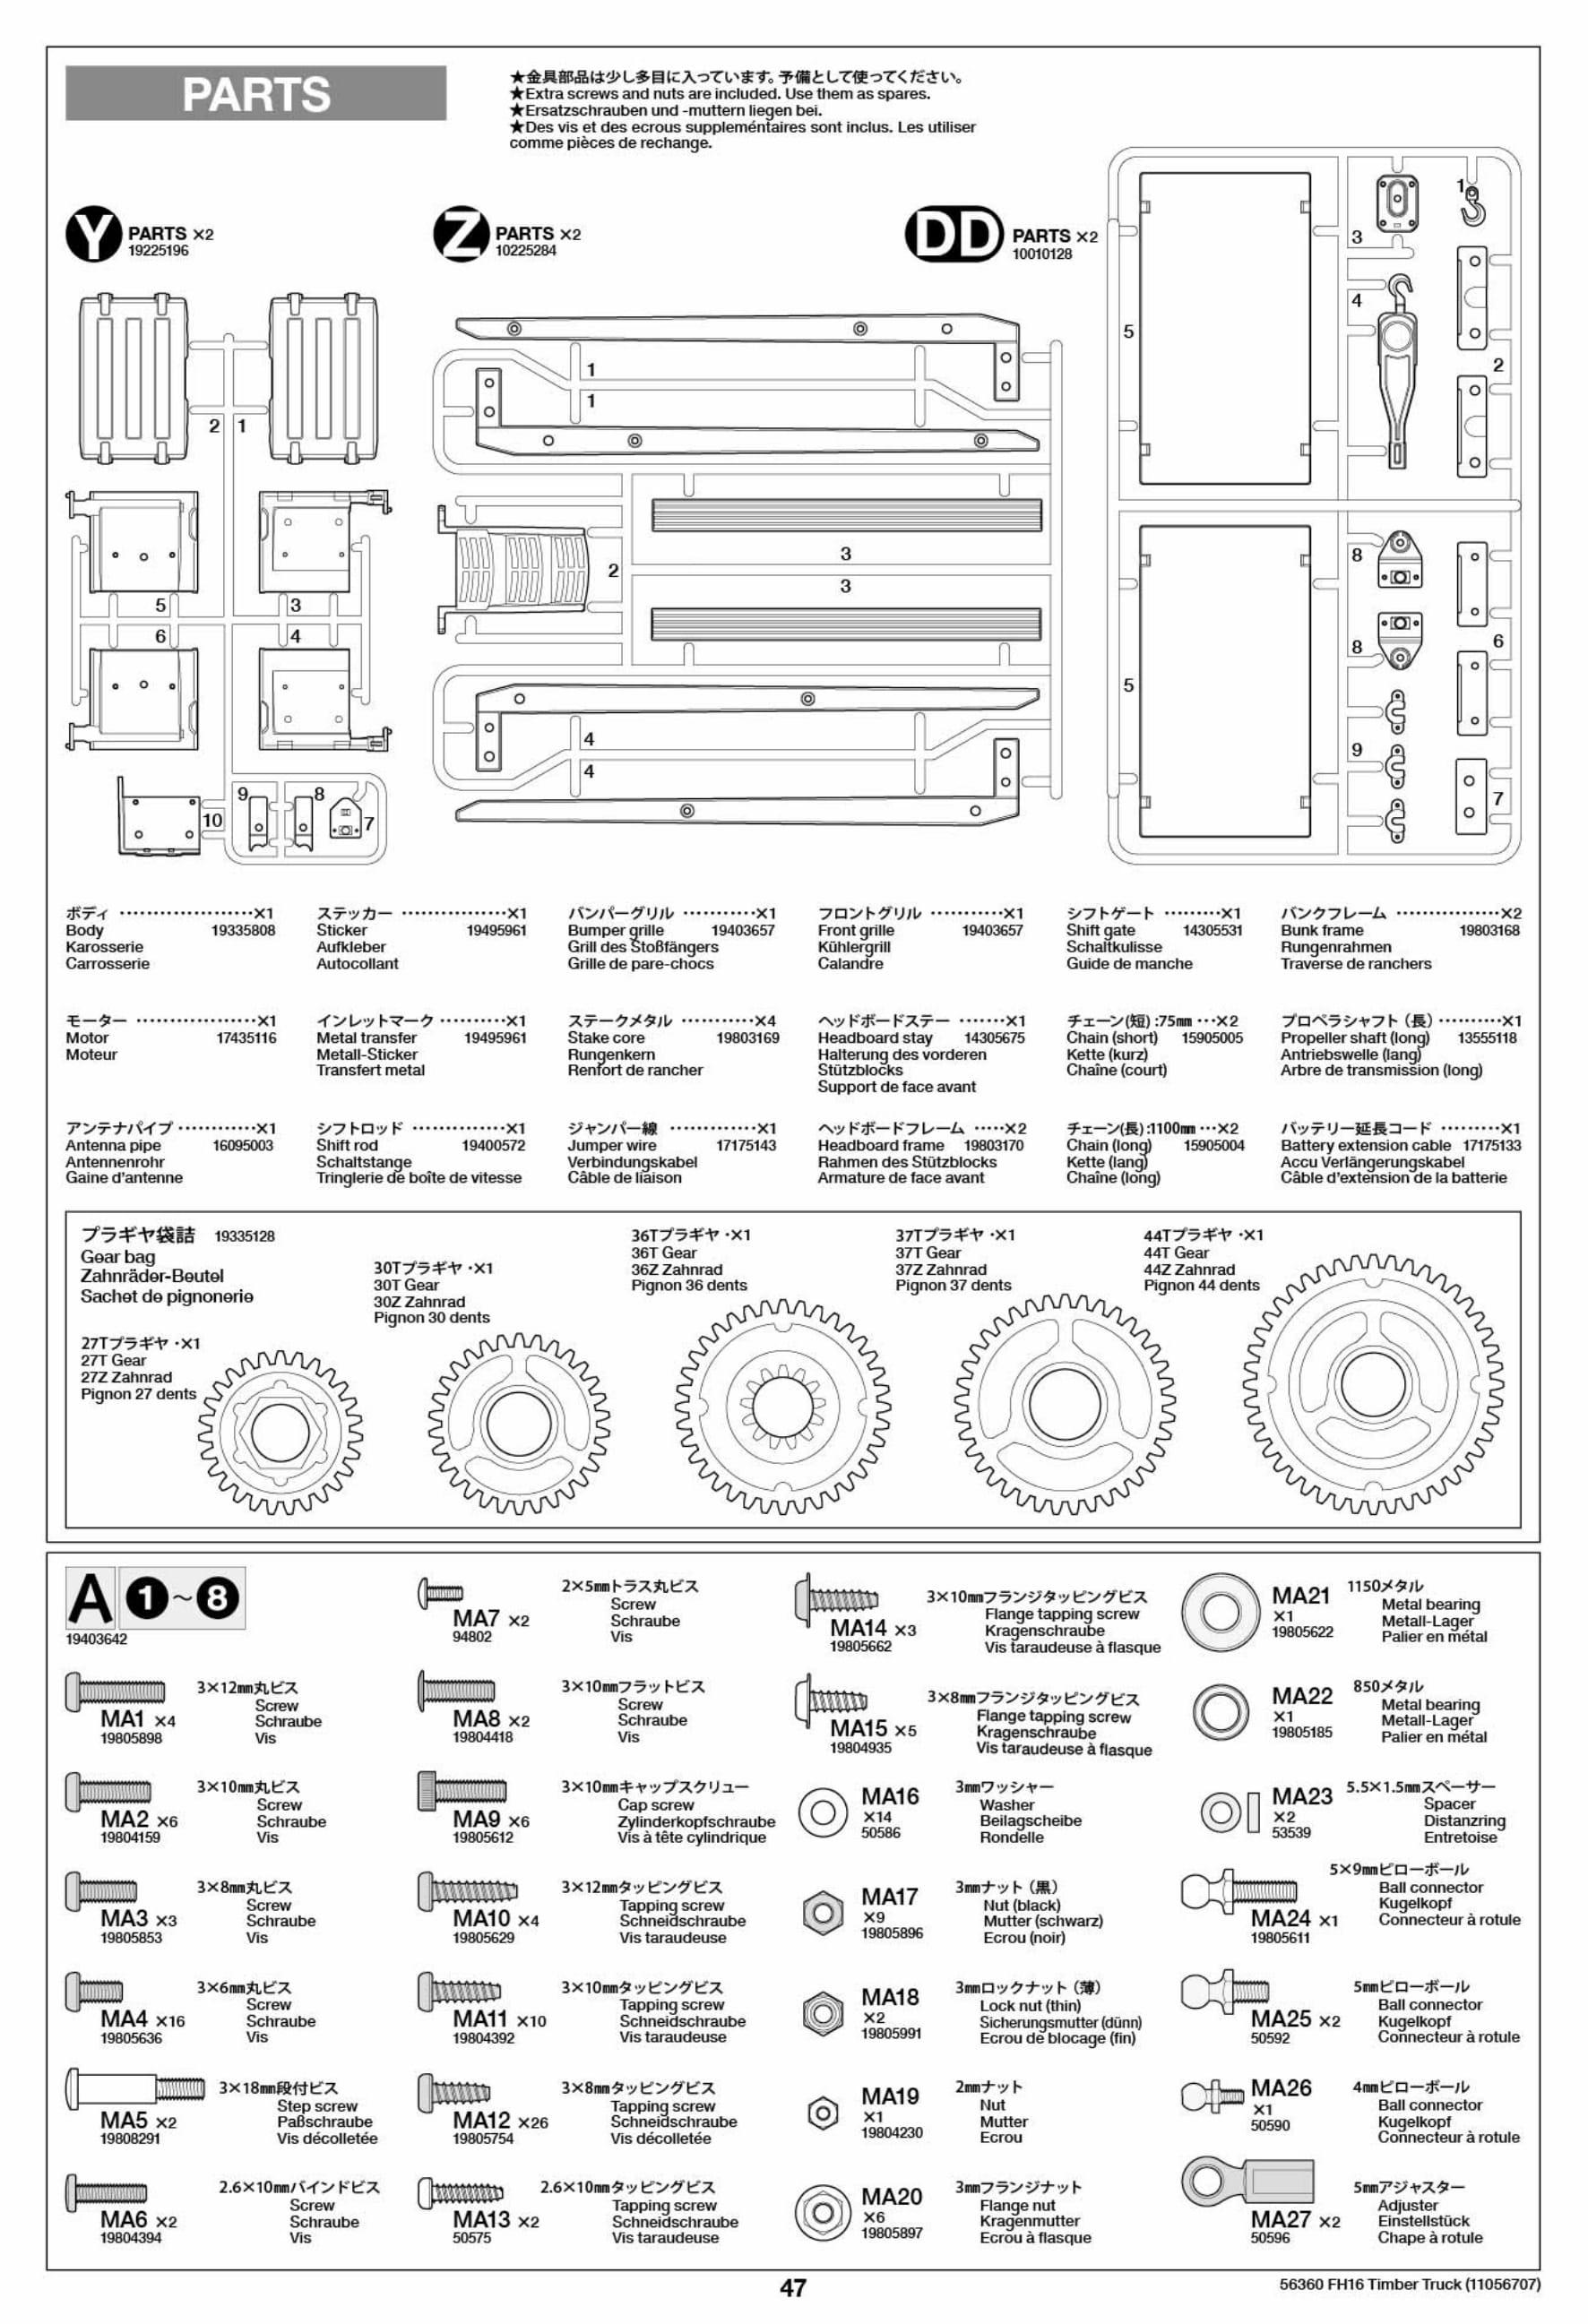 Datsun 260z 260 Z 74 Chassis Wiring Diagram Chart